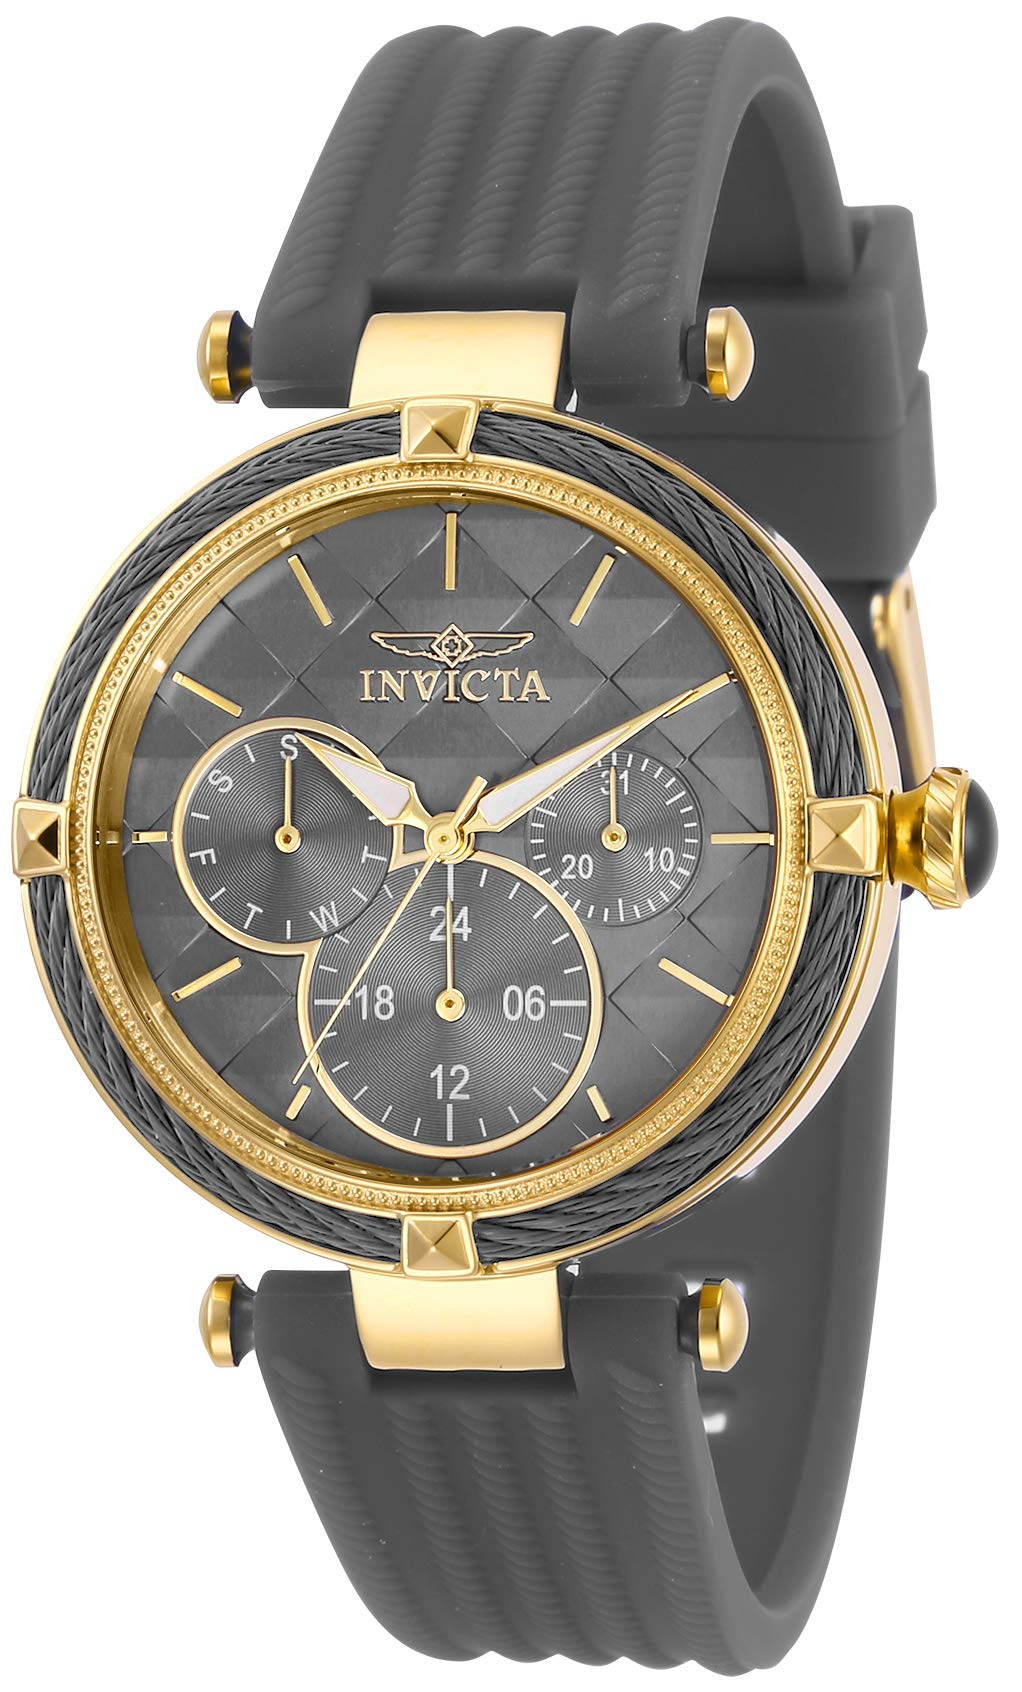 ویکالا · خرید  اصل اورجینال · خرید از آمازون · Invicta Women's Bolt Stainless Steel Quartz Polyurethane Strap, Grey, 18 Casual Watch (Model: 28967) wekala · ویکالا